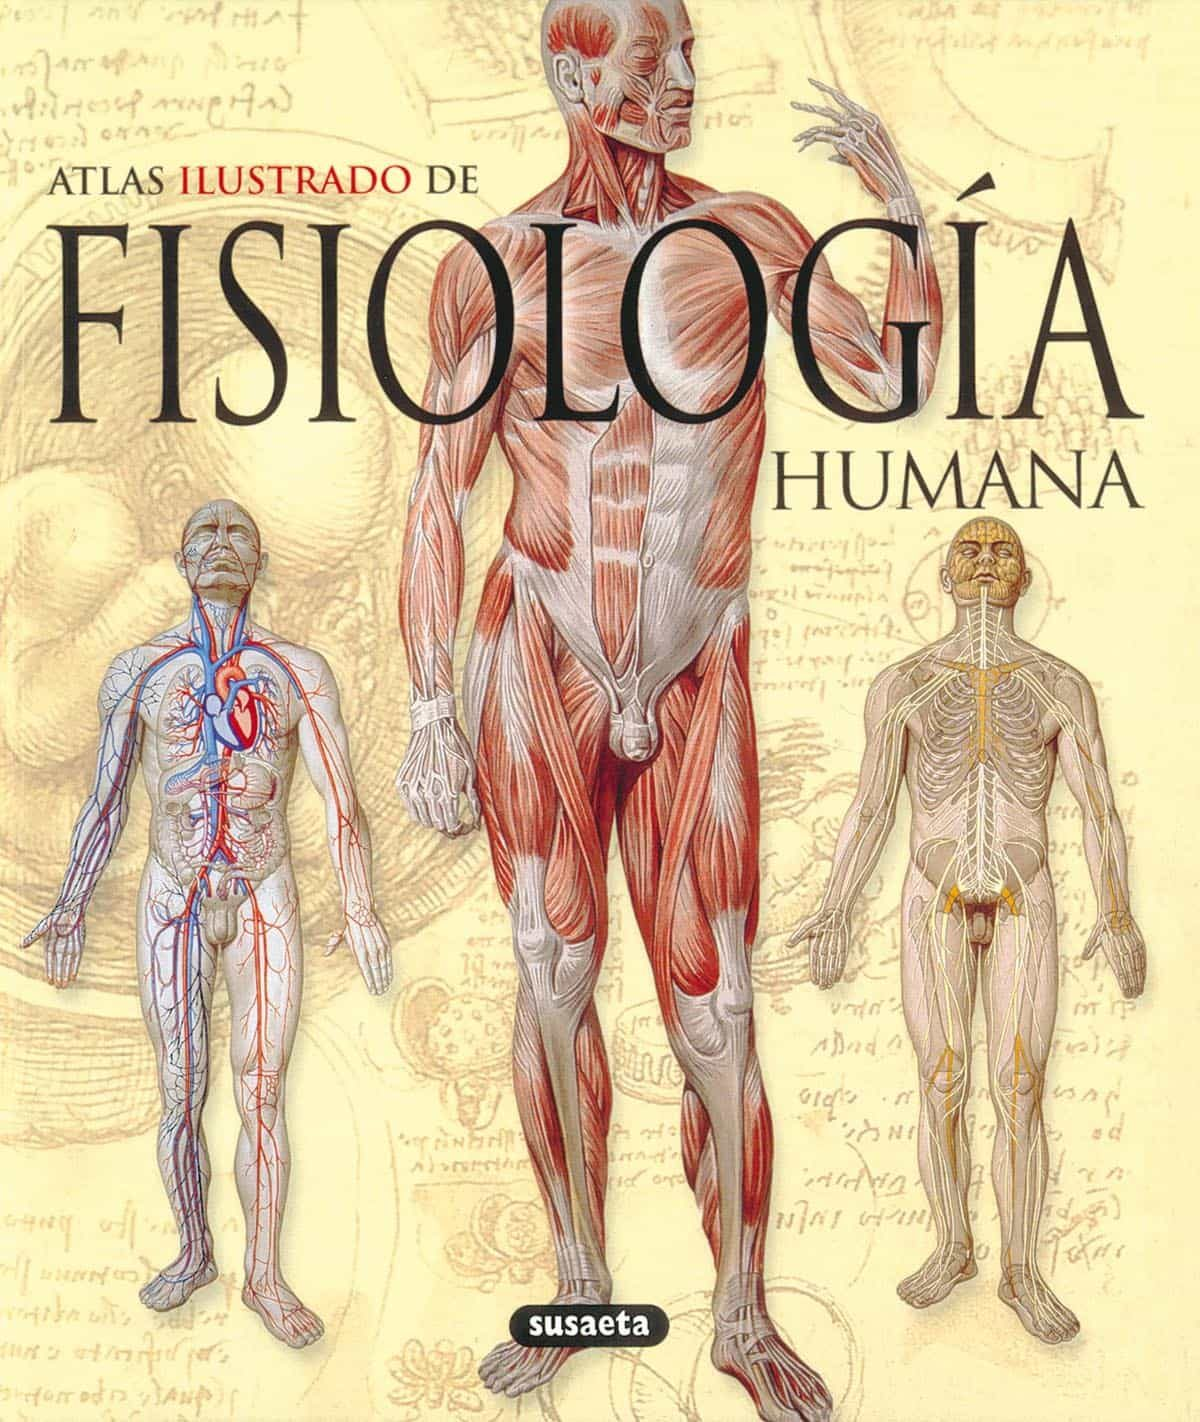 Fisiologia Humana: Atlas Ilustrado - Vv.aa.